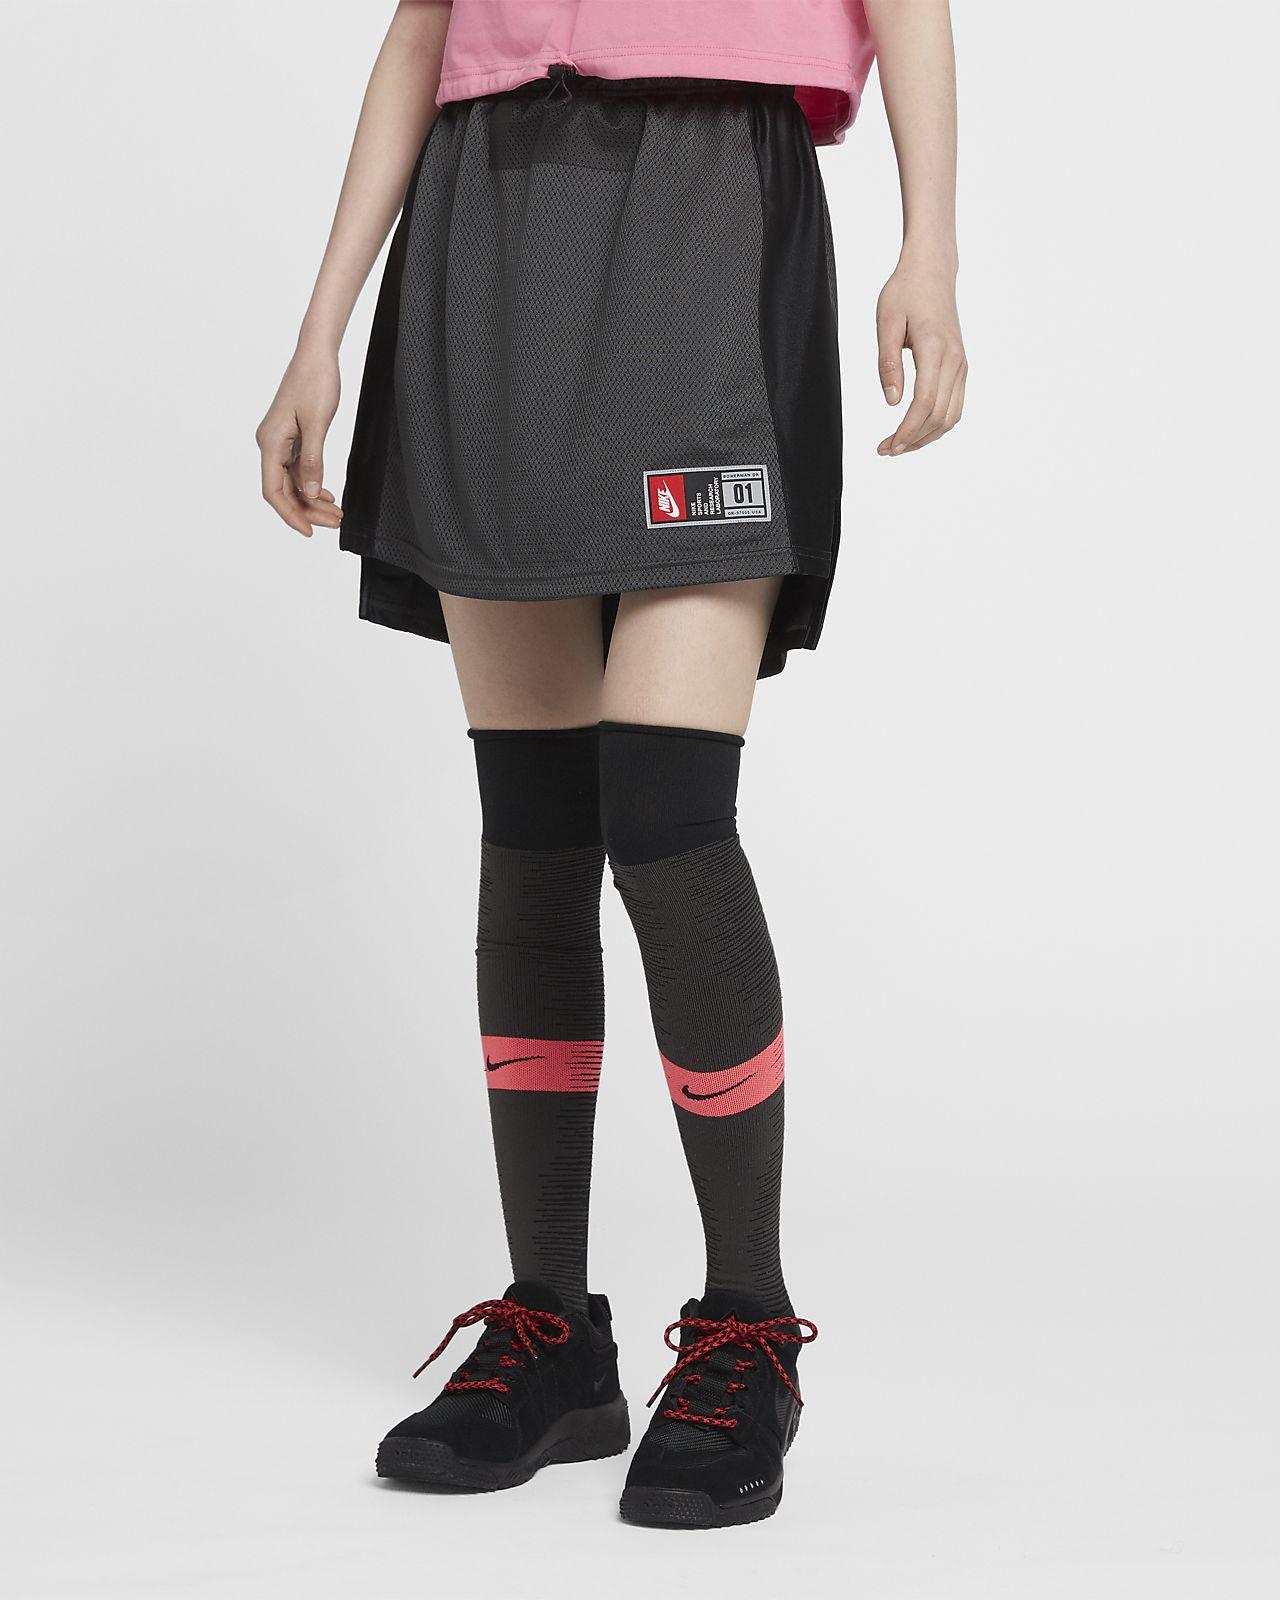 Gonna da football americano NikeLab Collection - Donna